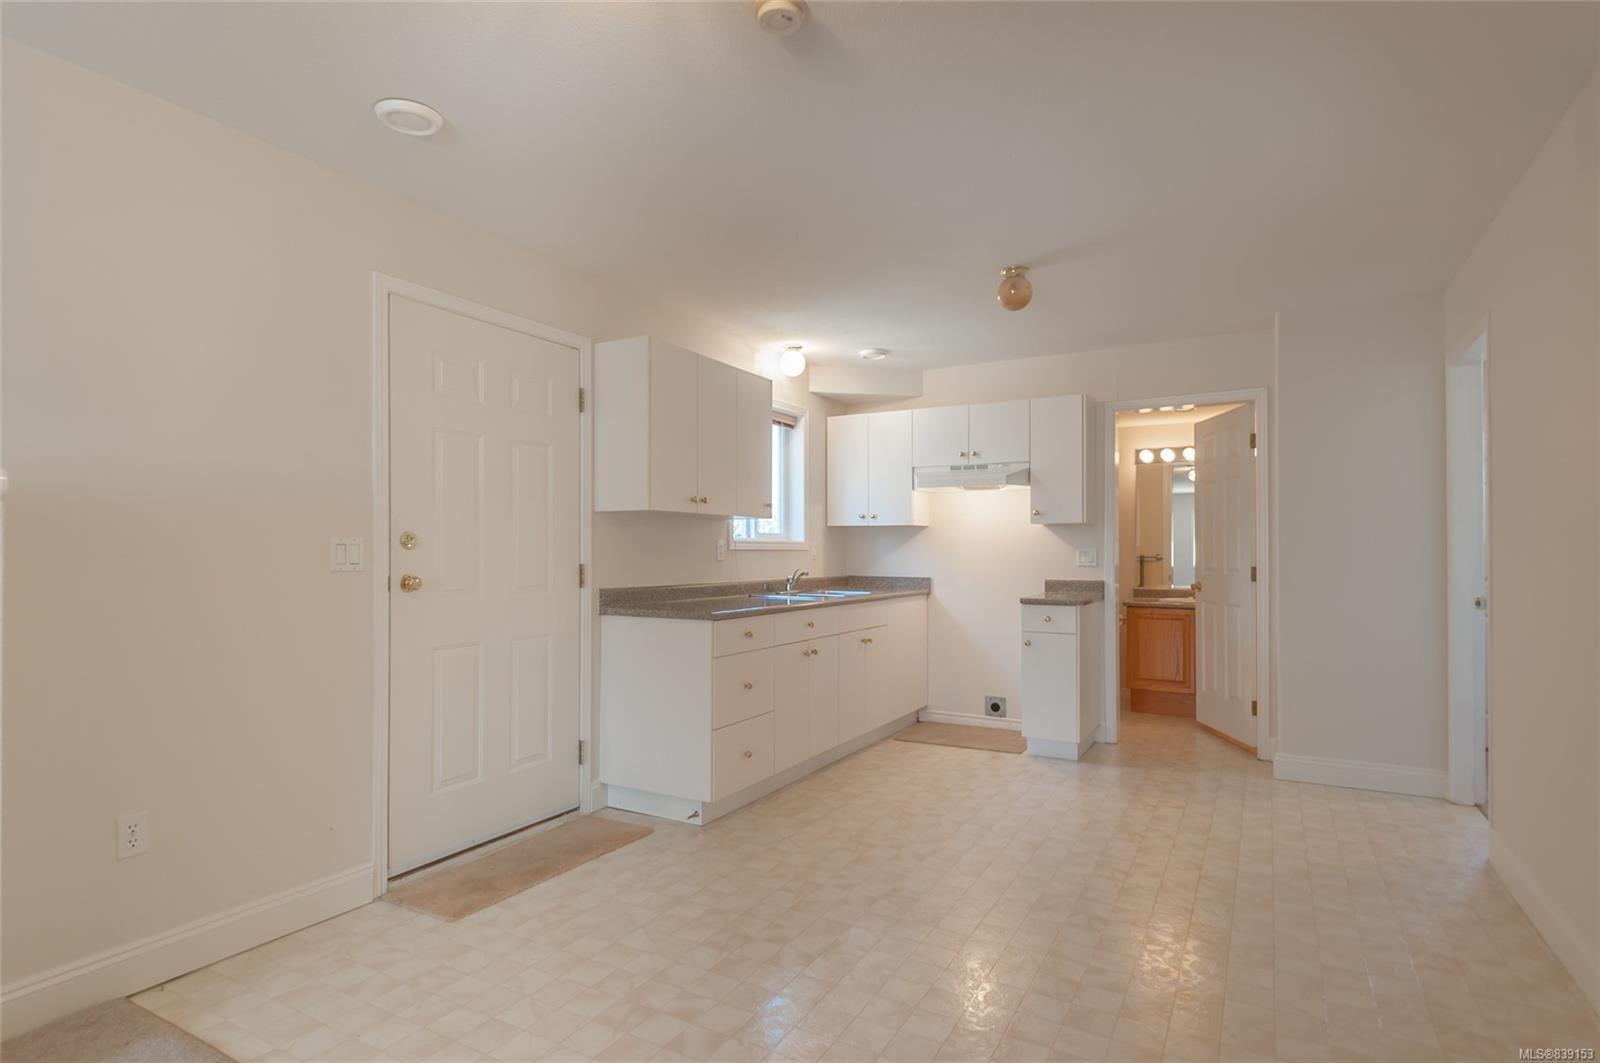 Photo 43: Photos: 6412 Dover Rd in NANAIMO: Na North Nanaimo House for sale (Nanaimo)  : MLS®# 839153